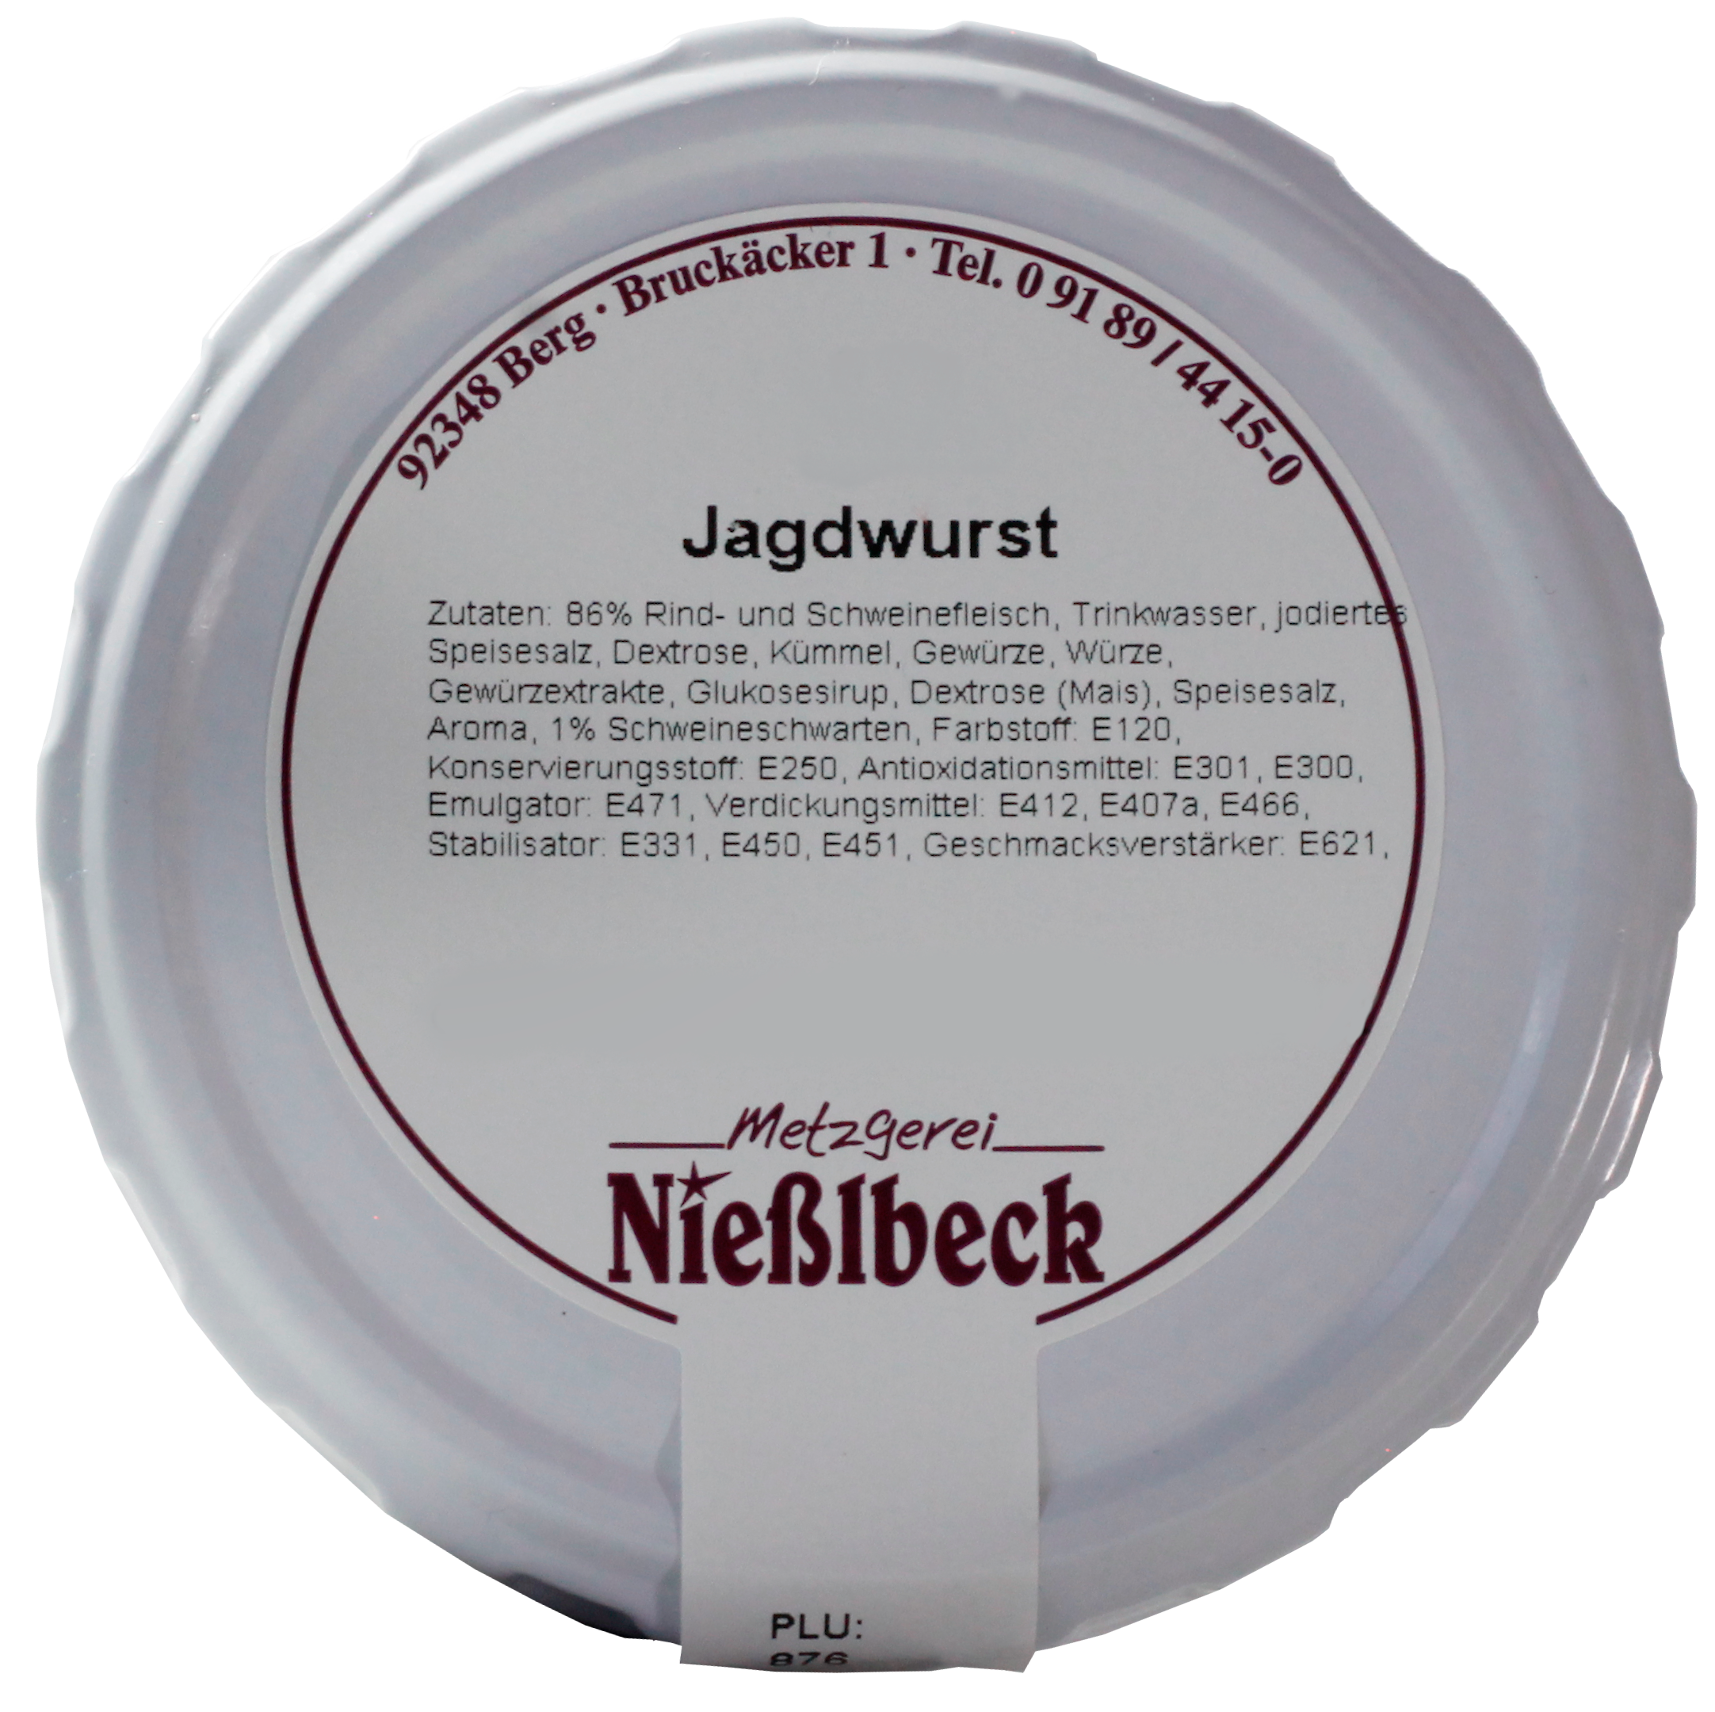 Jagdwurst (Glas 180g)